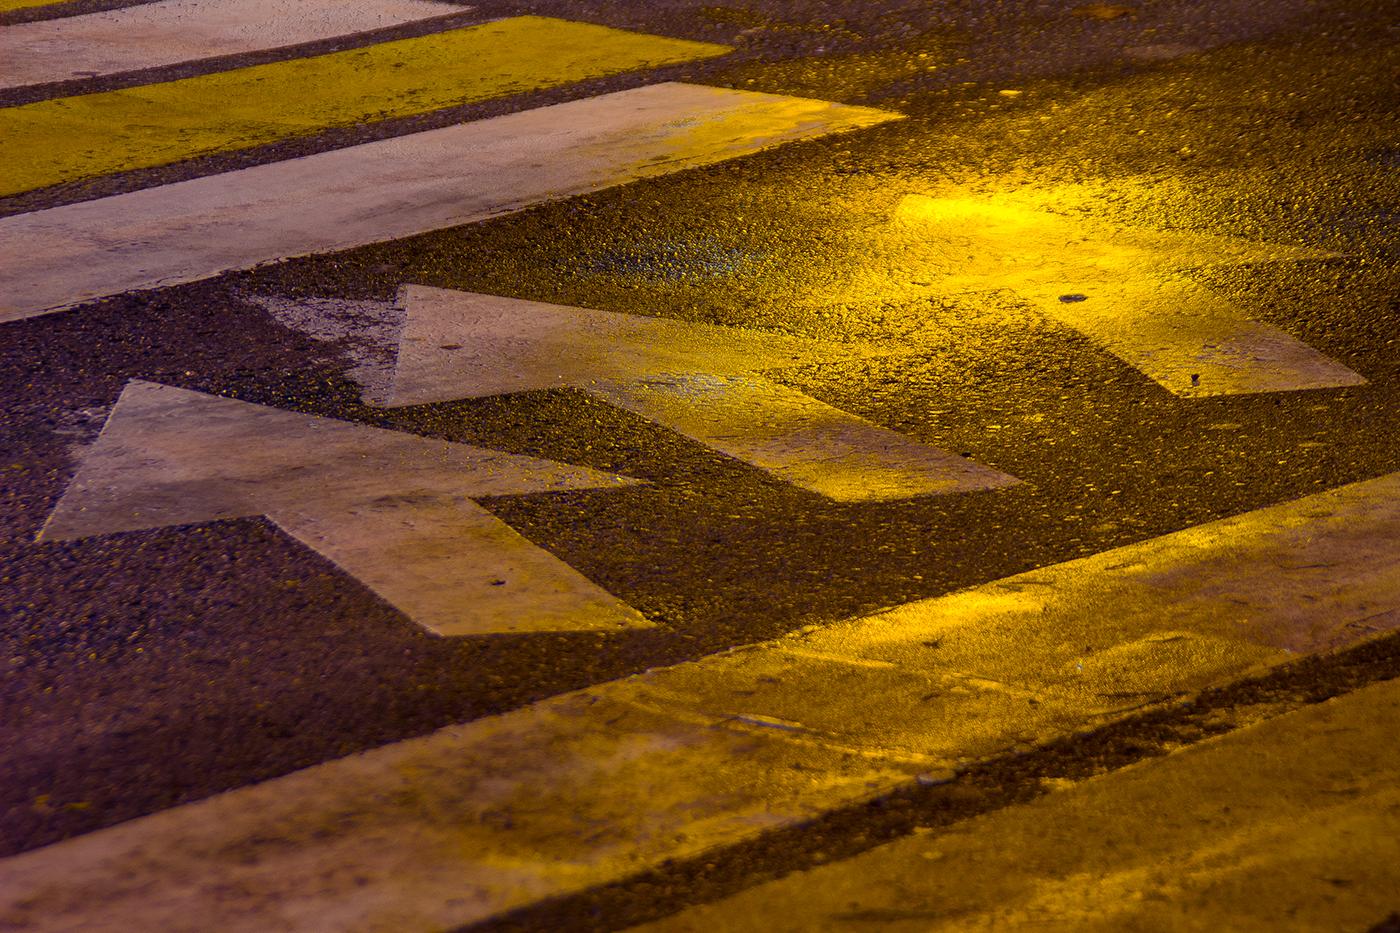 wet-neon-local-preacher-photography-15.jpg